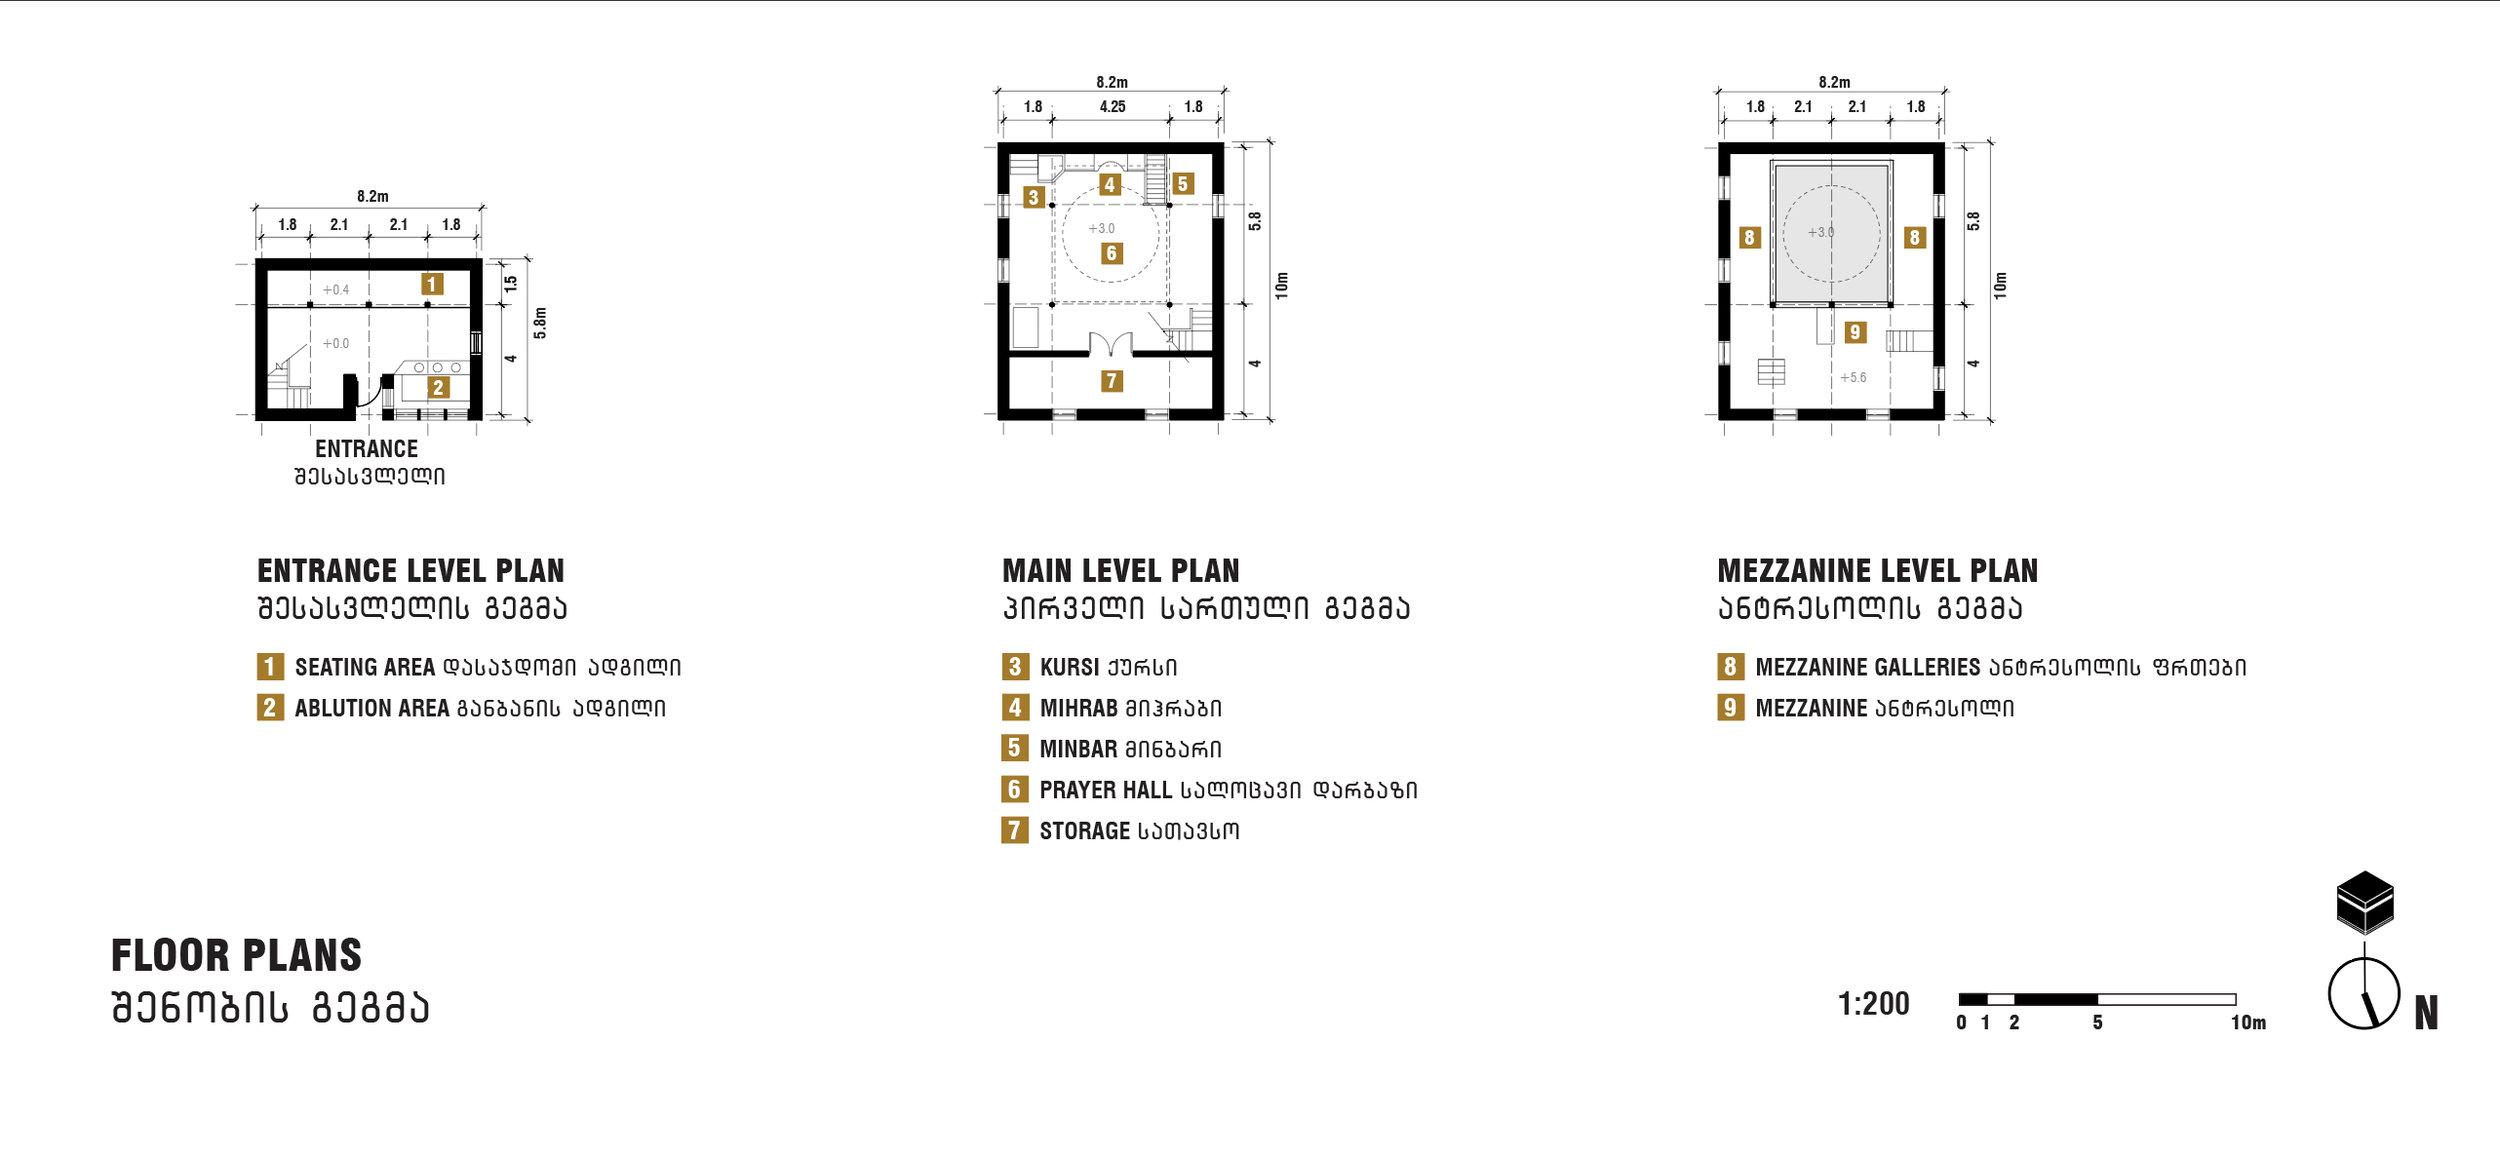 CHAO_Floorplans 1-200 copy.jpg